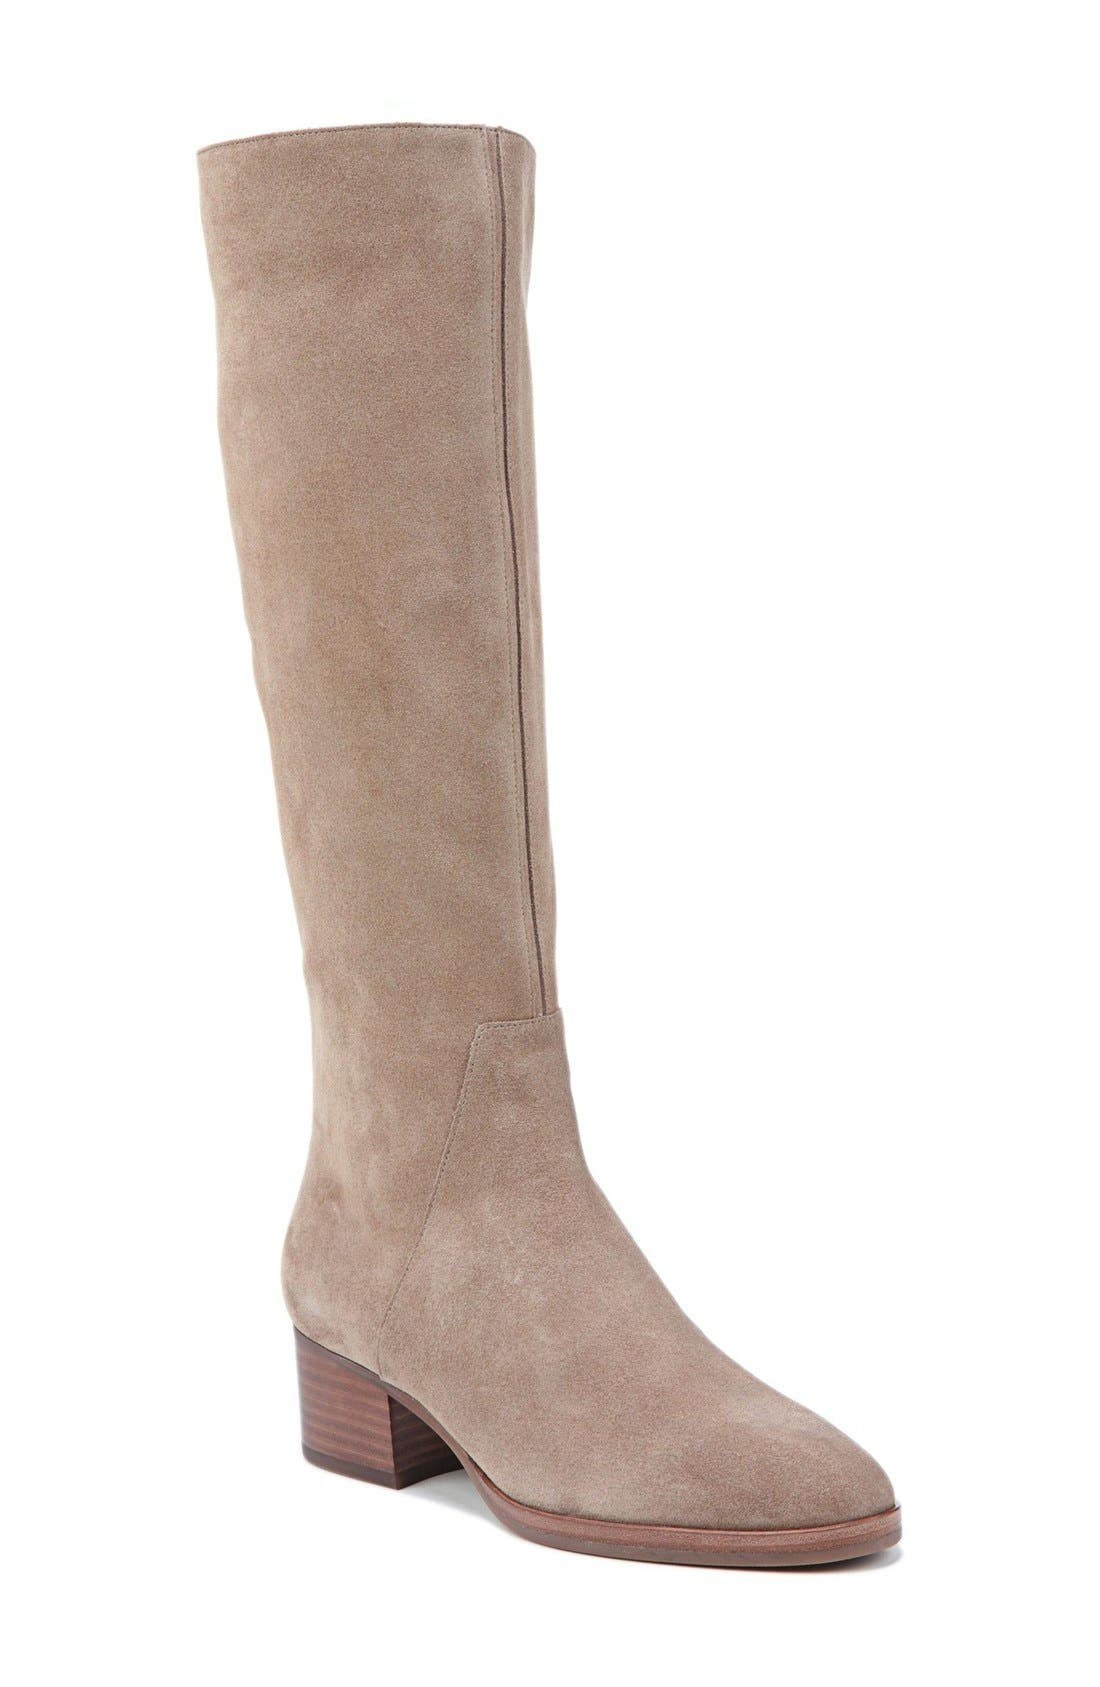 Main Image - Via Spiga 'Odella' Tall Boot (Women)